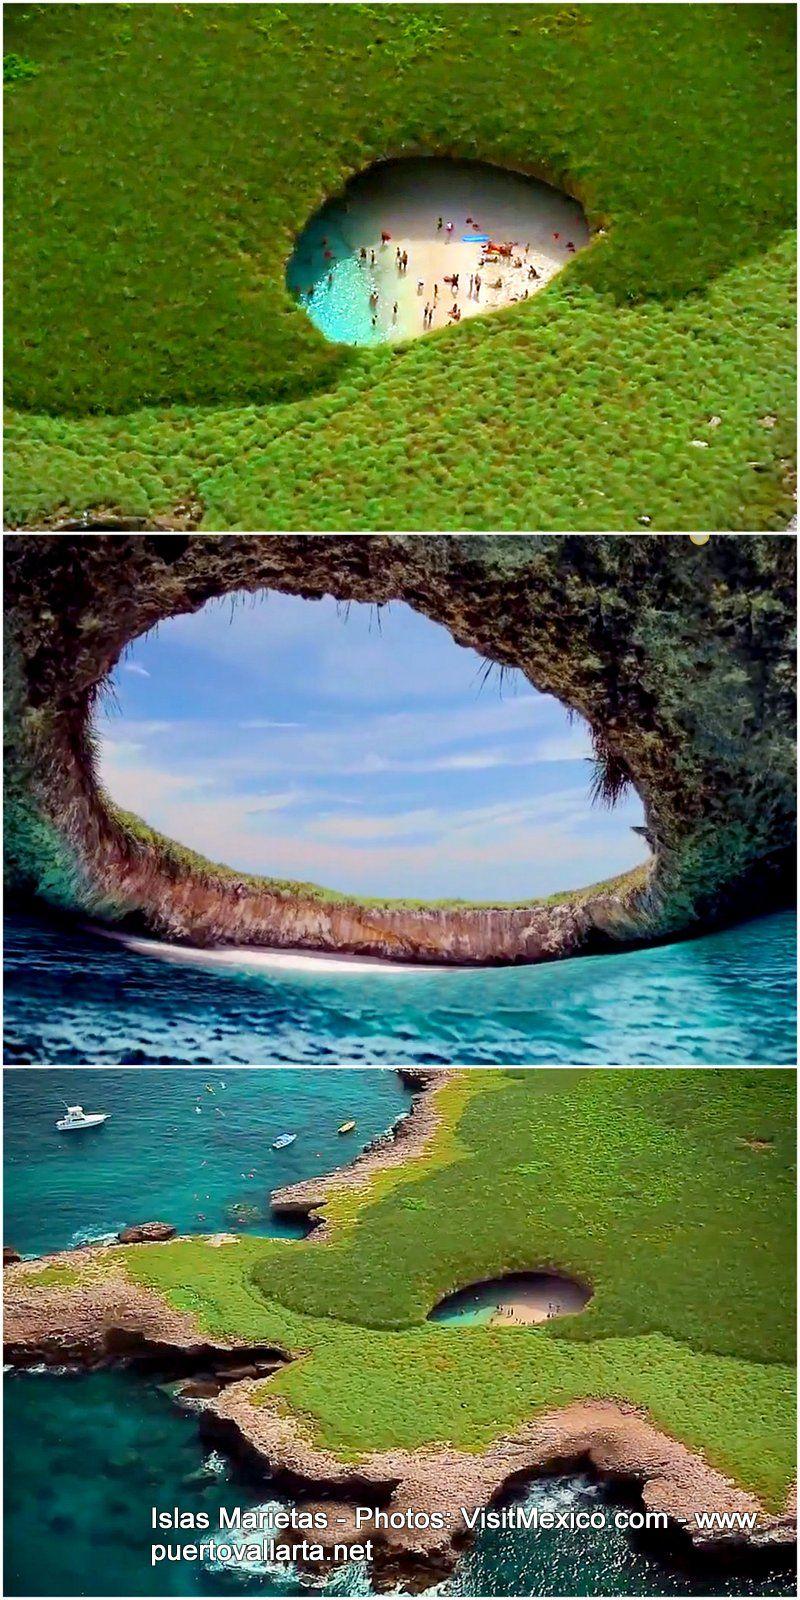 Playa escondida marieta islands mexico lugares pinterest playa escondida marieta islands mexico altavistaventures Images